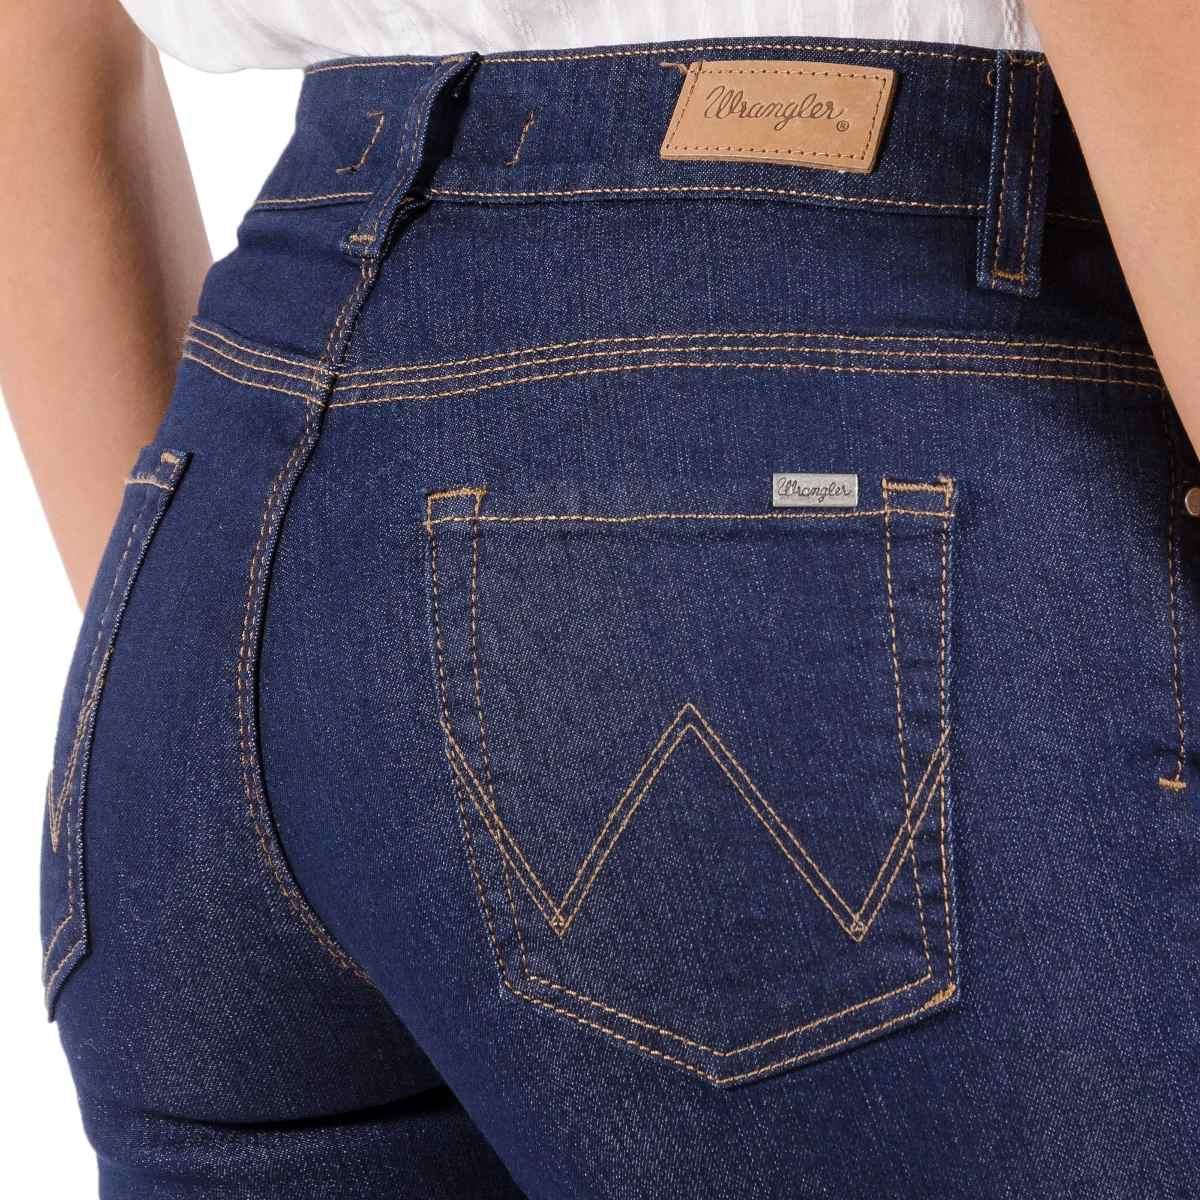 0512781043 mujer mandy wrangler Cargando zoom jeans dm tIqZ5xxU